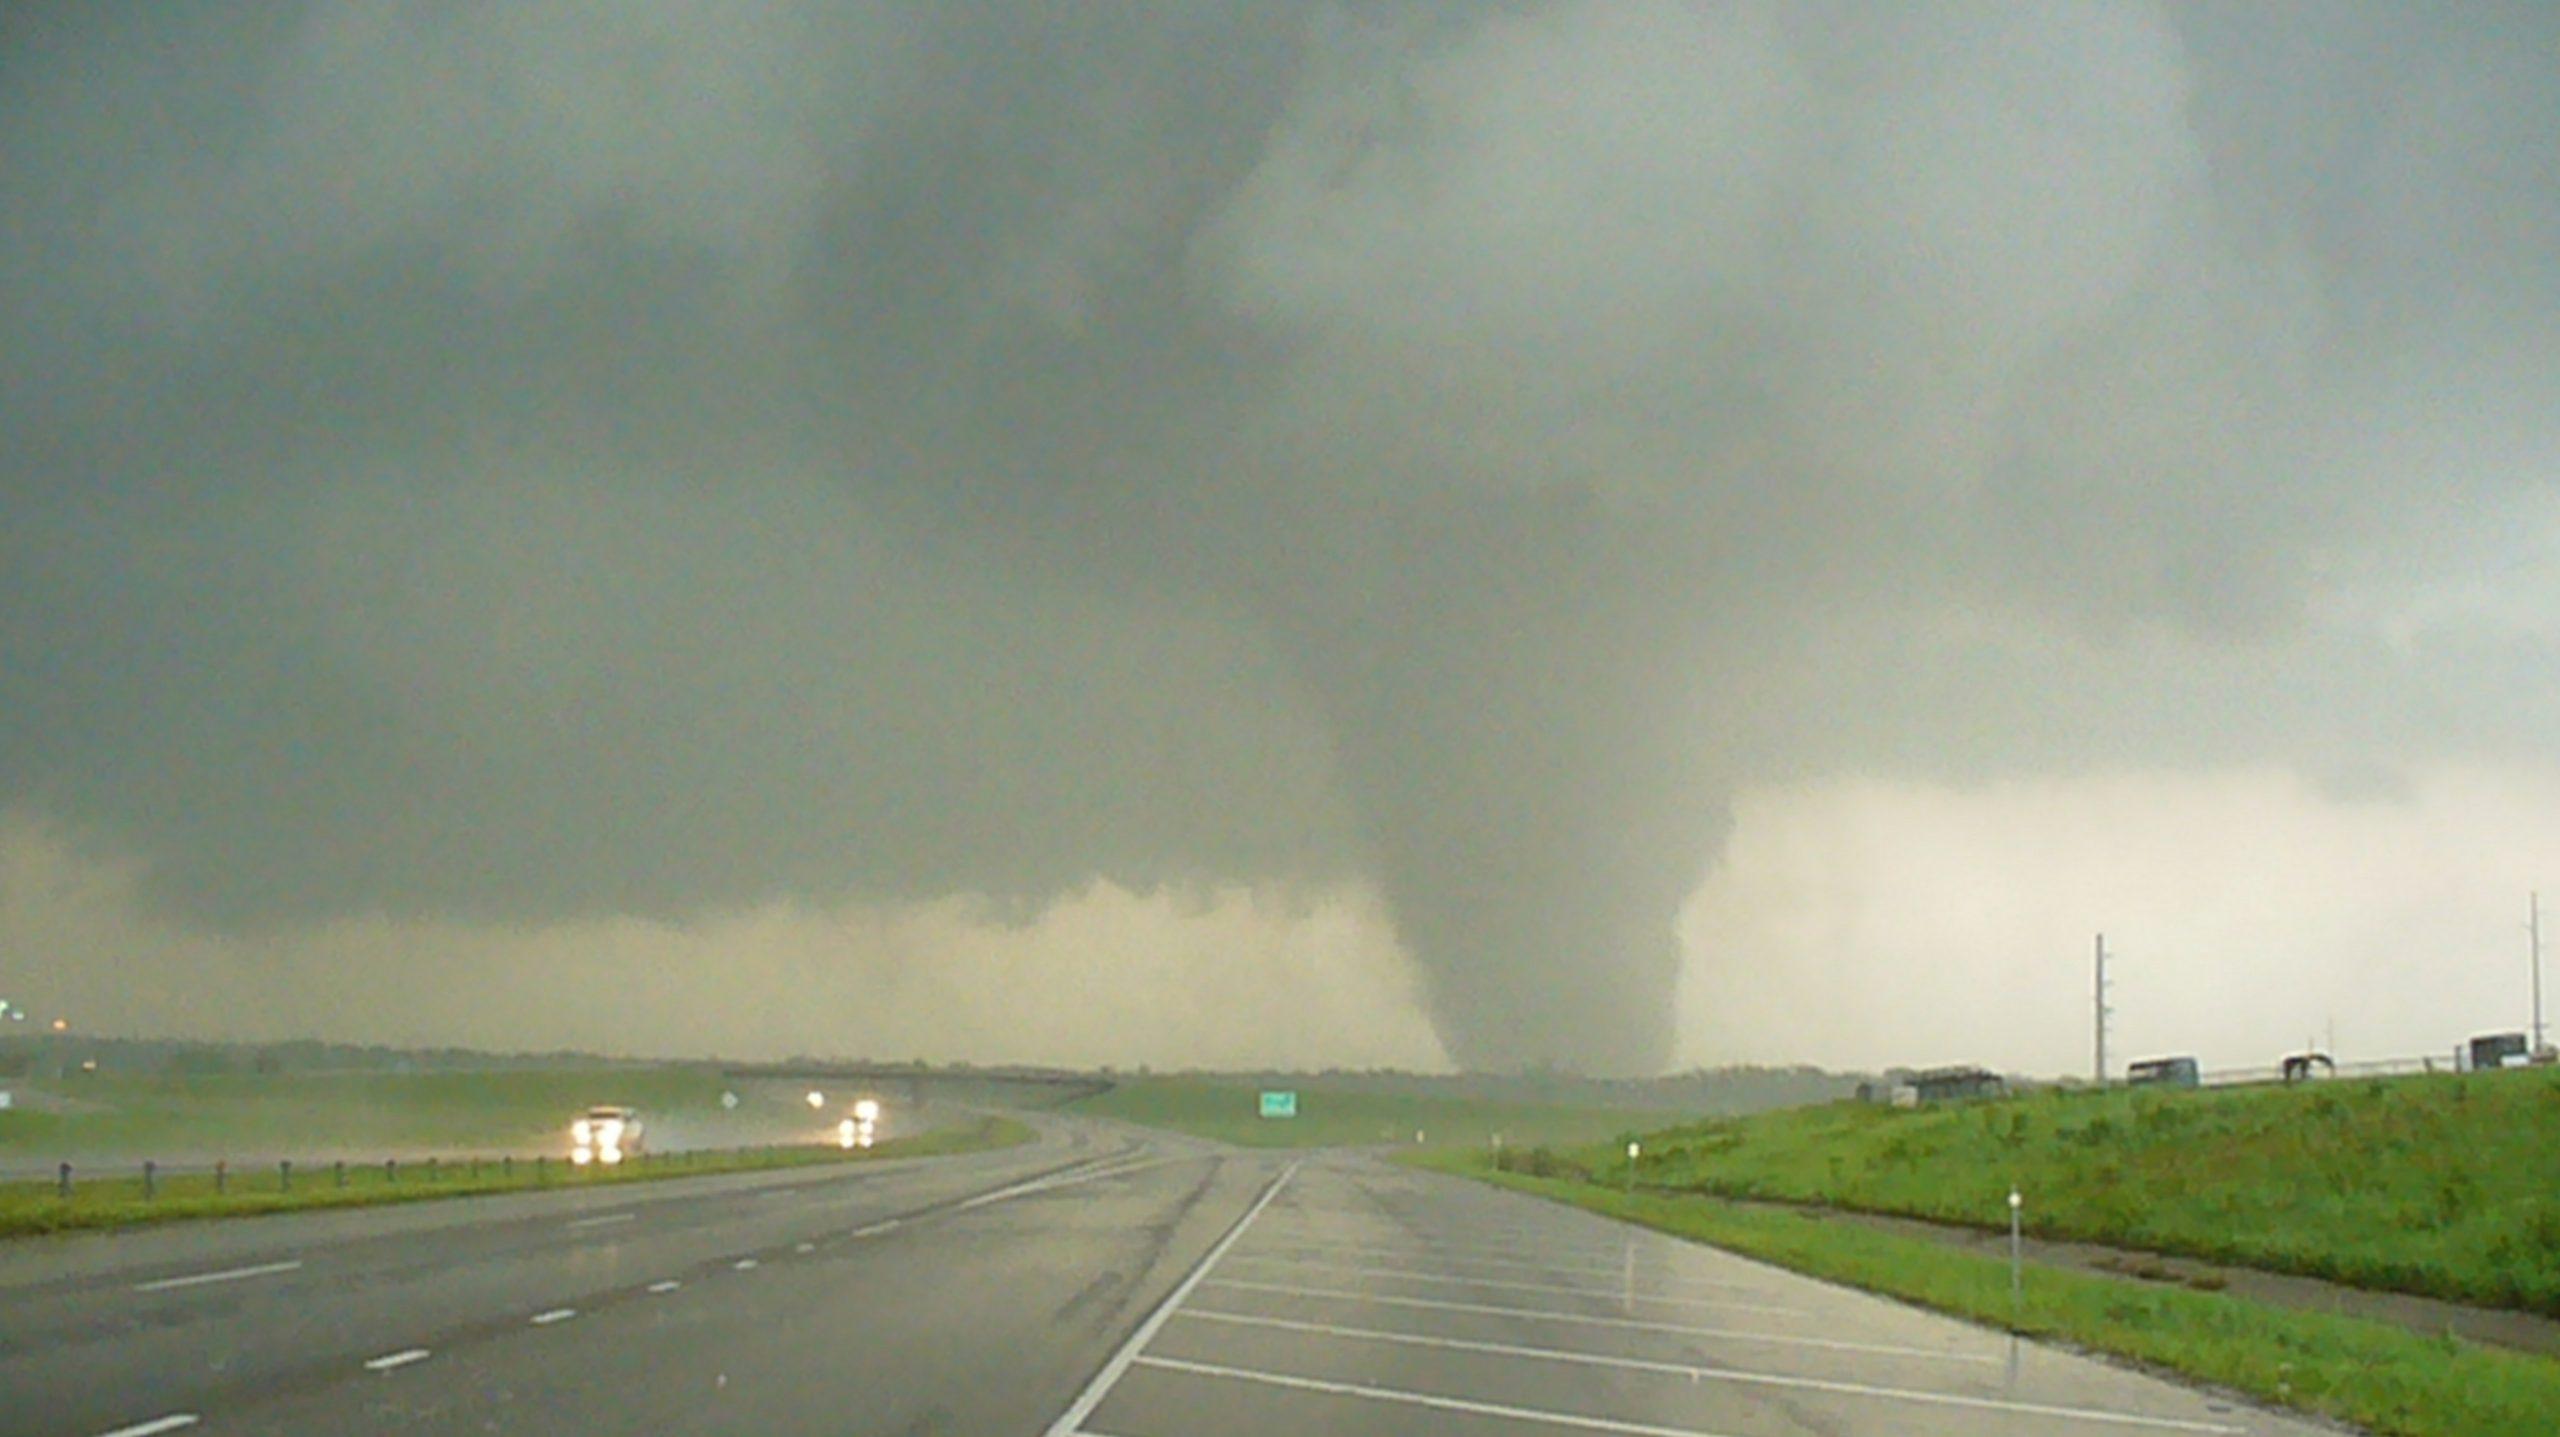 Tornado in Oklahoma, 2013. (NOAA)